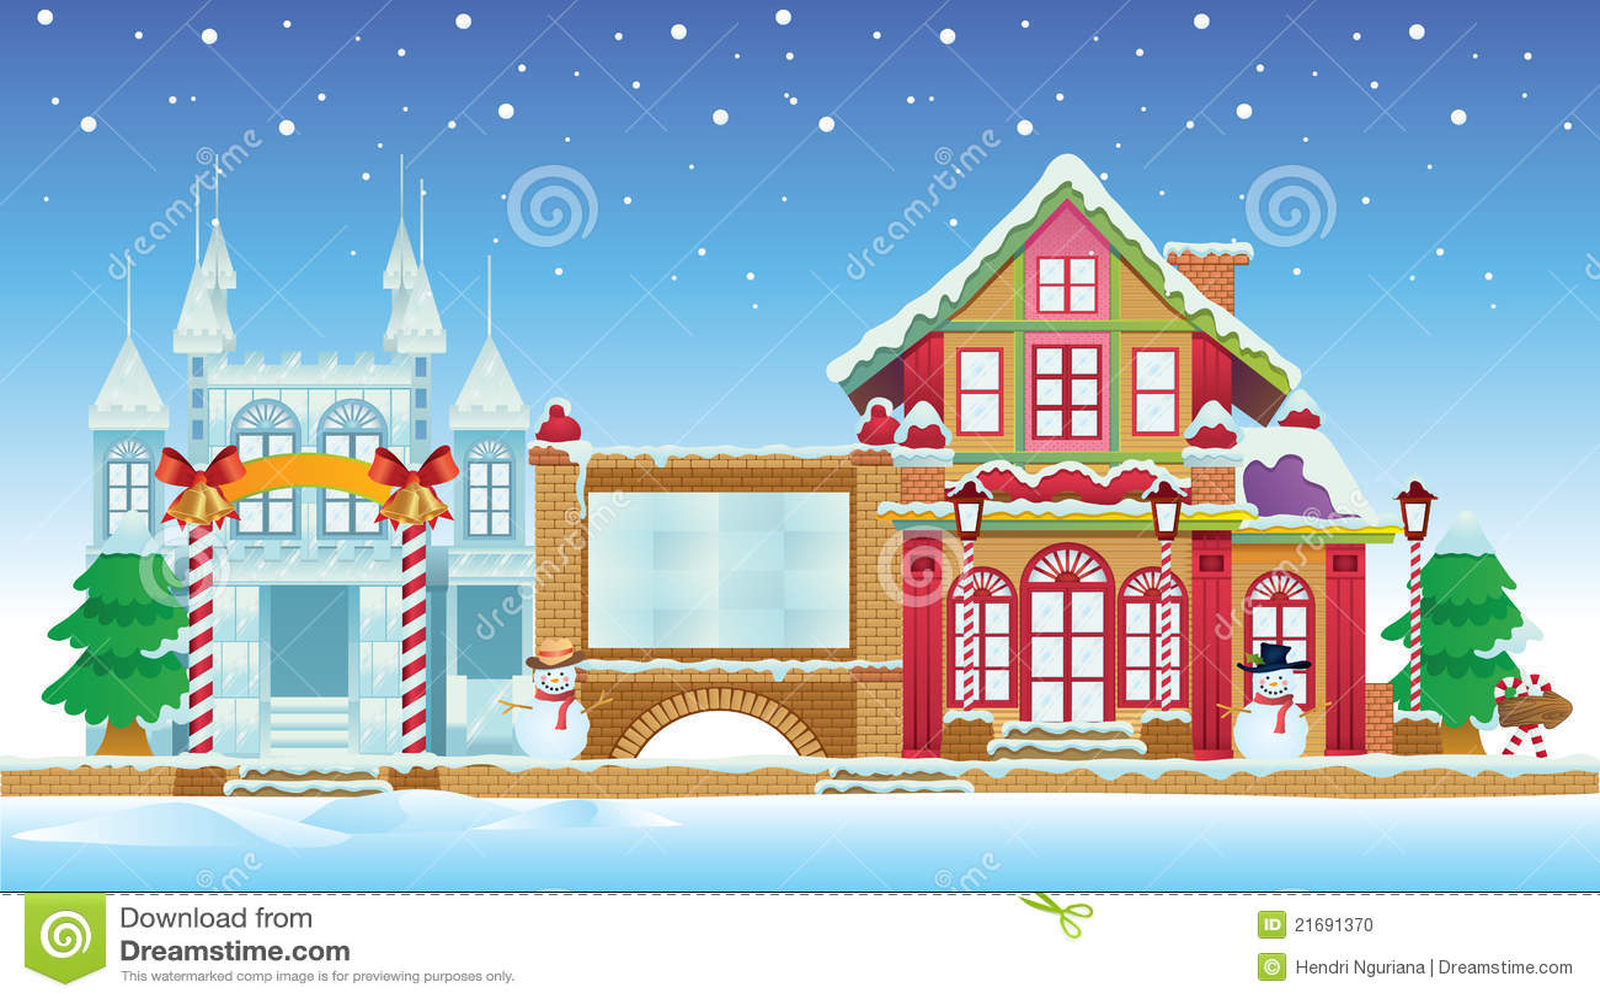 Santa House And Ice Castle Stock Photo Image 21691370